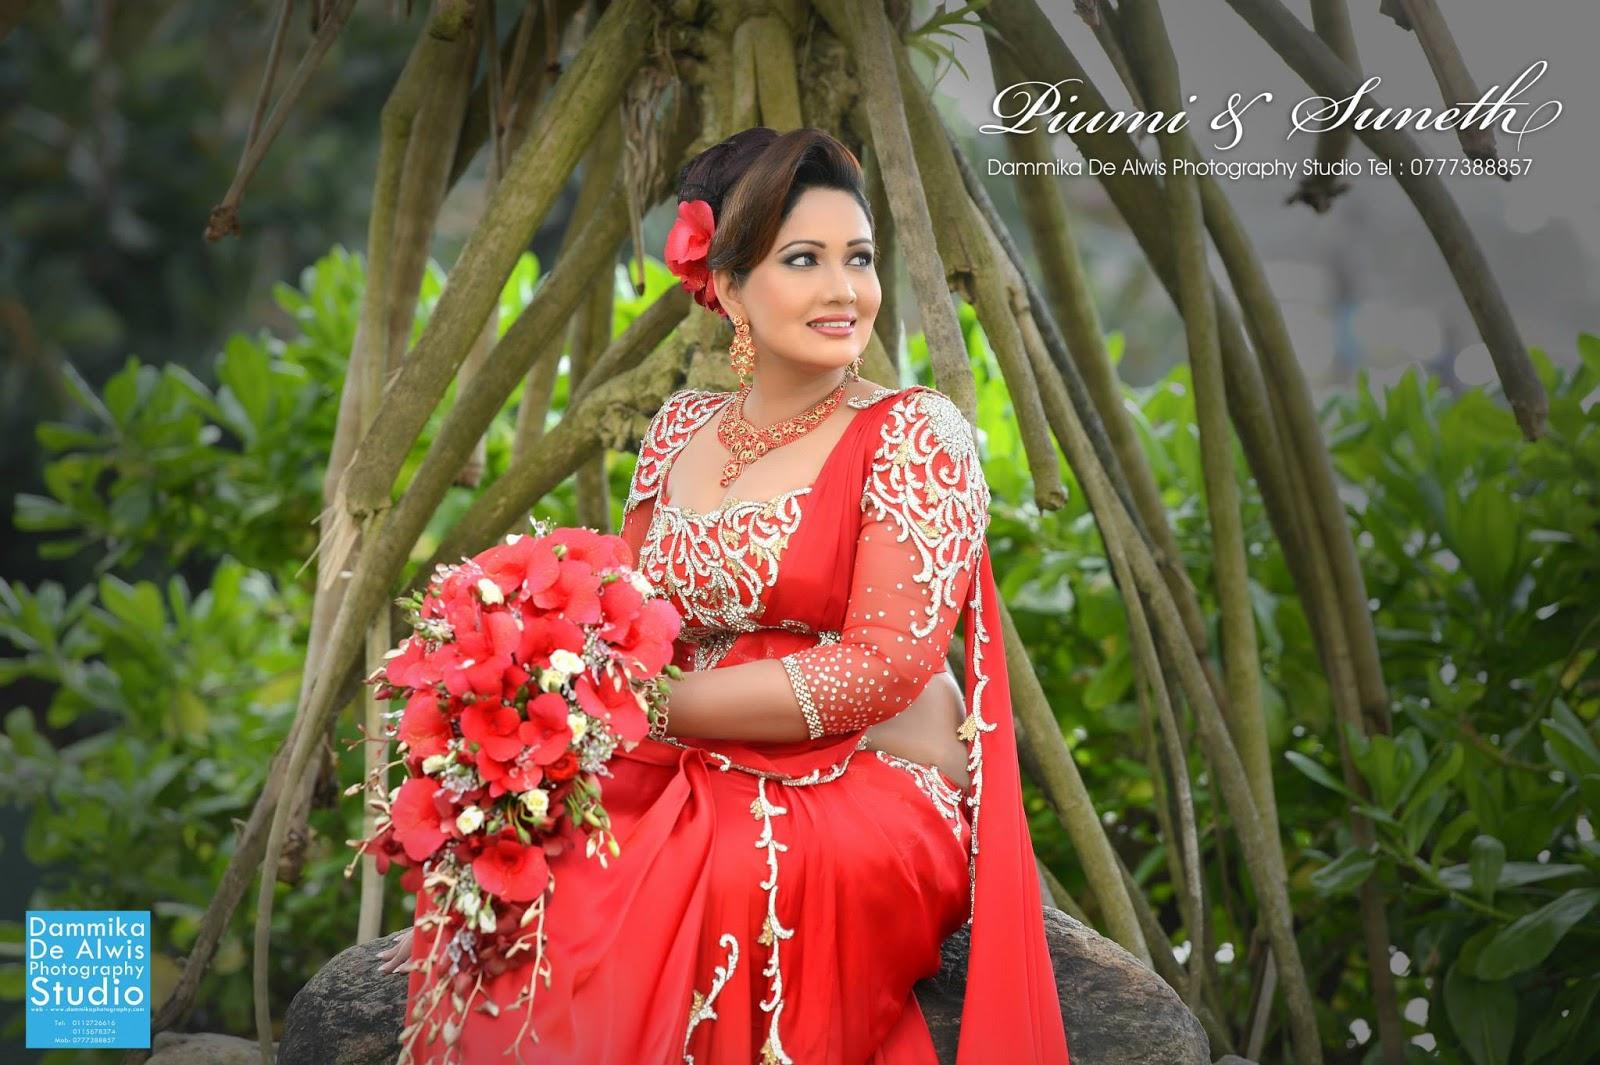 sri lanka actress and models: Piyumi Botheju